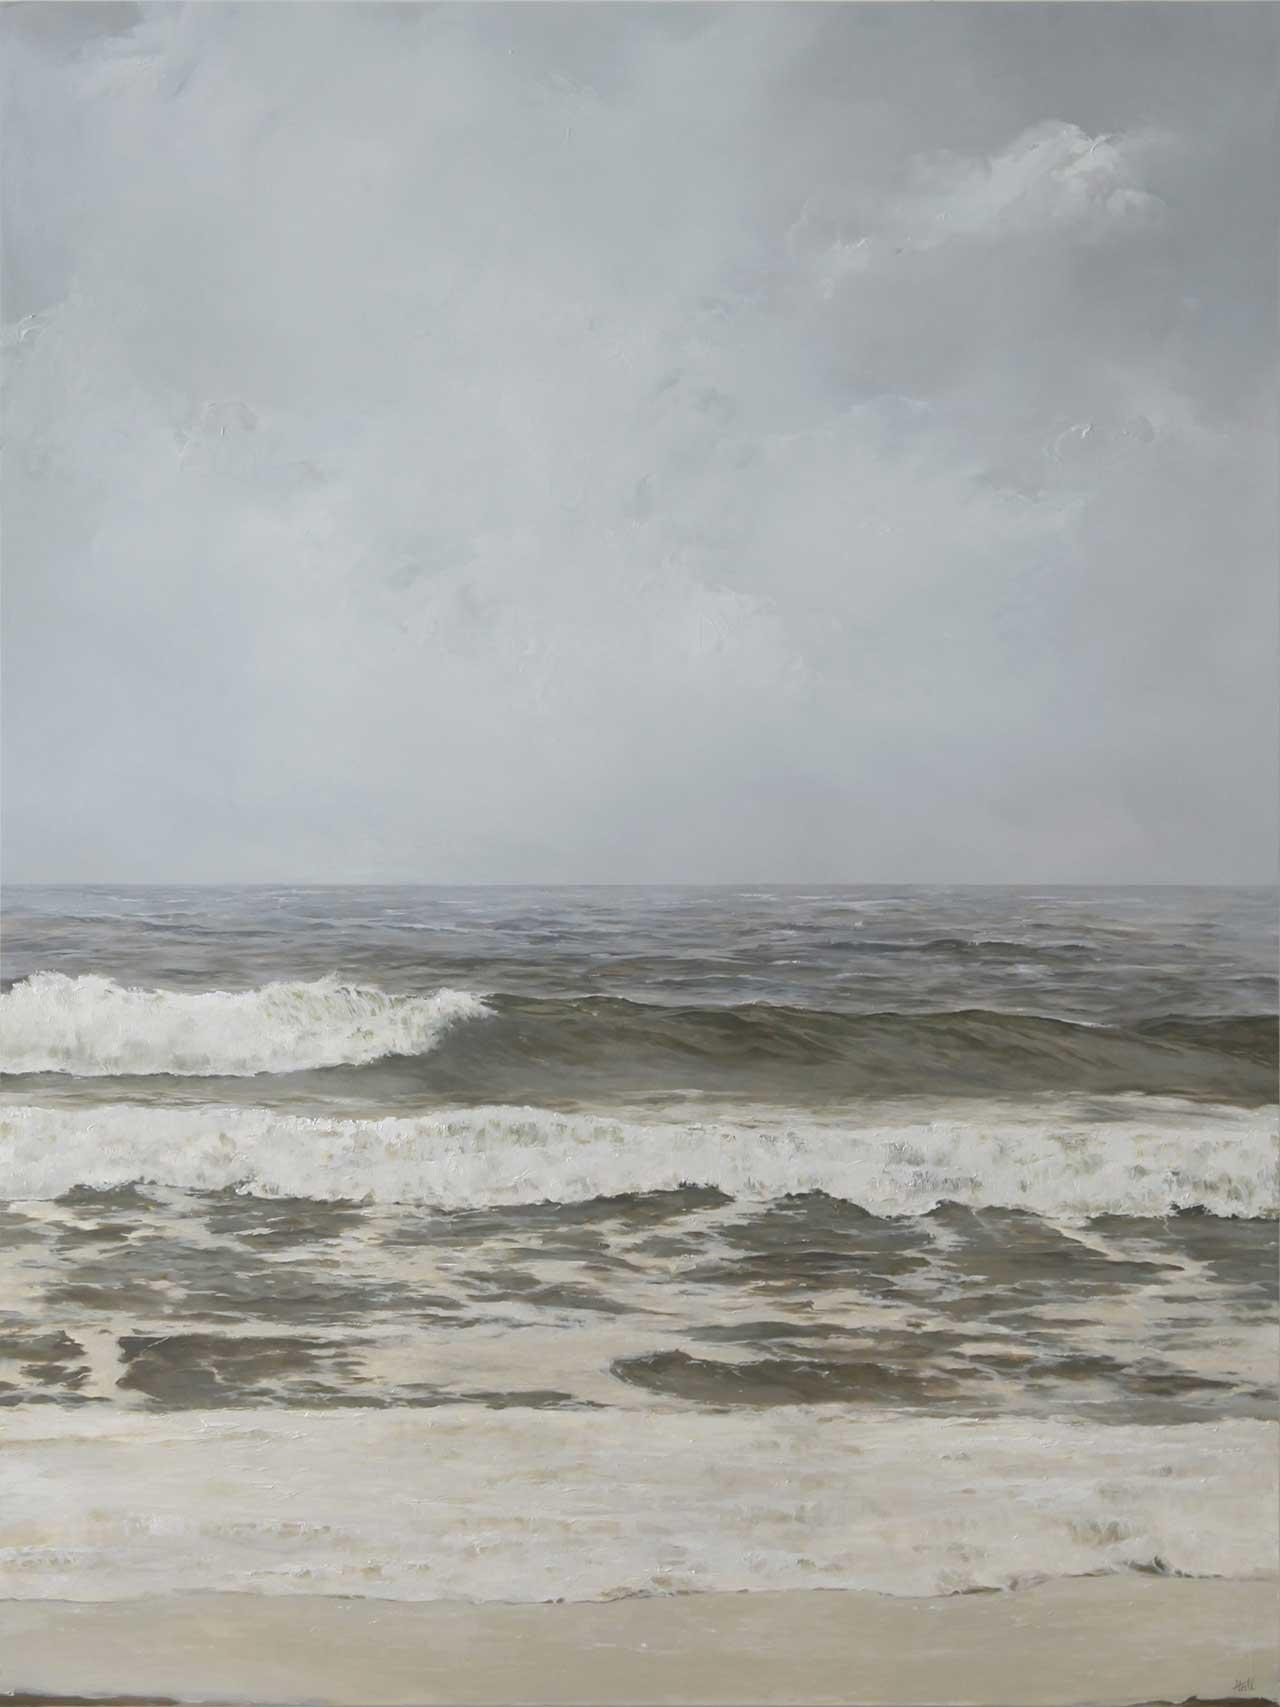 "Adam Hall,Familiar Currents, 30"" x 40"", oil on panel. CourtesyRobert Lange Studios and the artist."